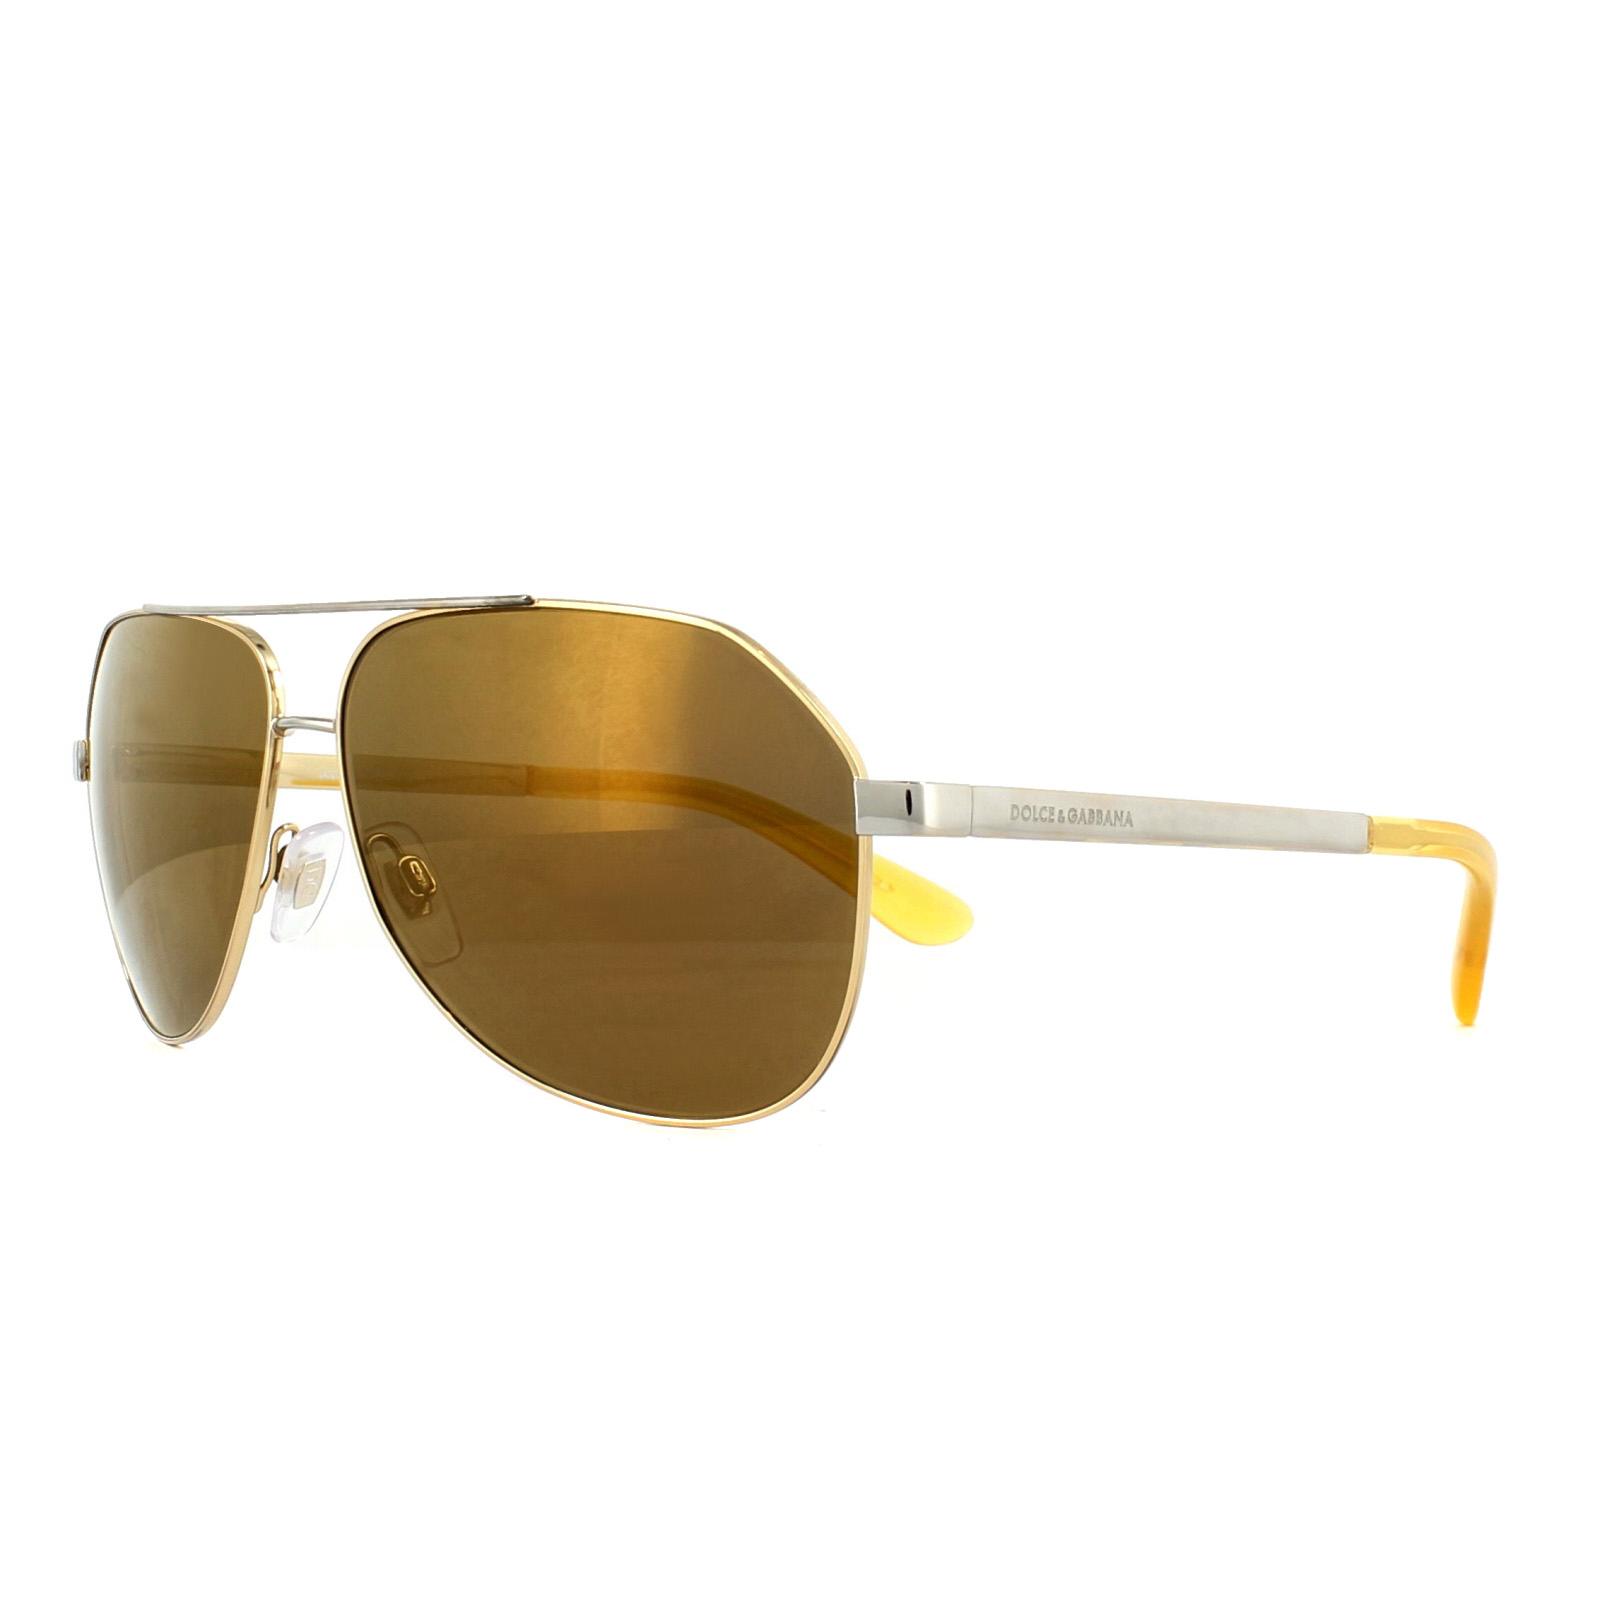 0bf94004ac5 Dolce   Gabbana Sunglasses 2144 02 N0 Gold 24K Iridium 8053672697315 ...